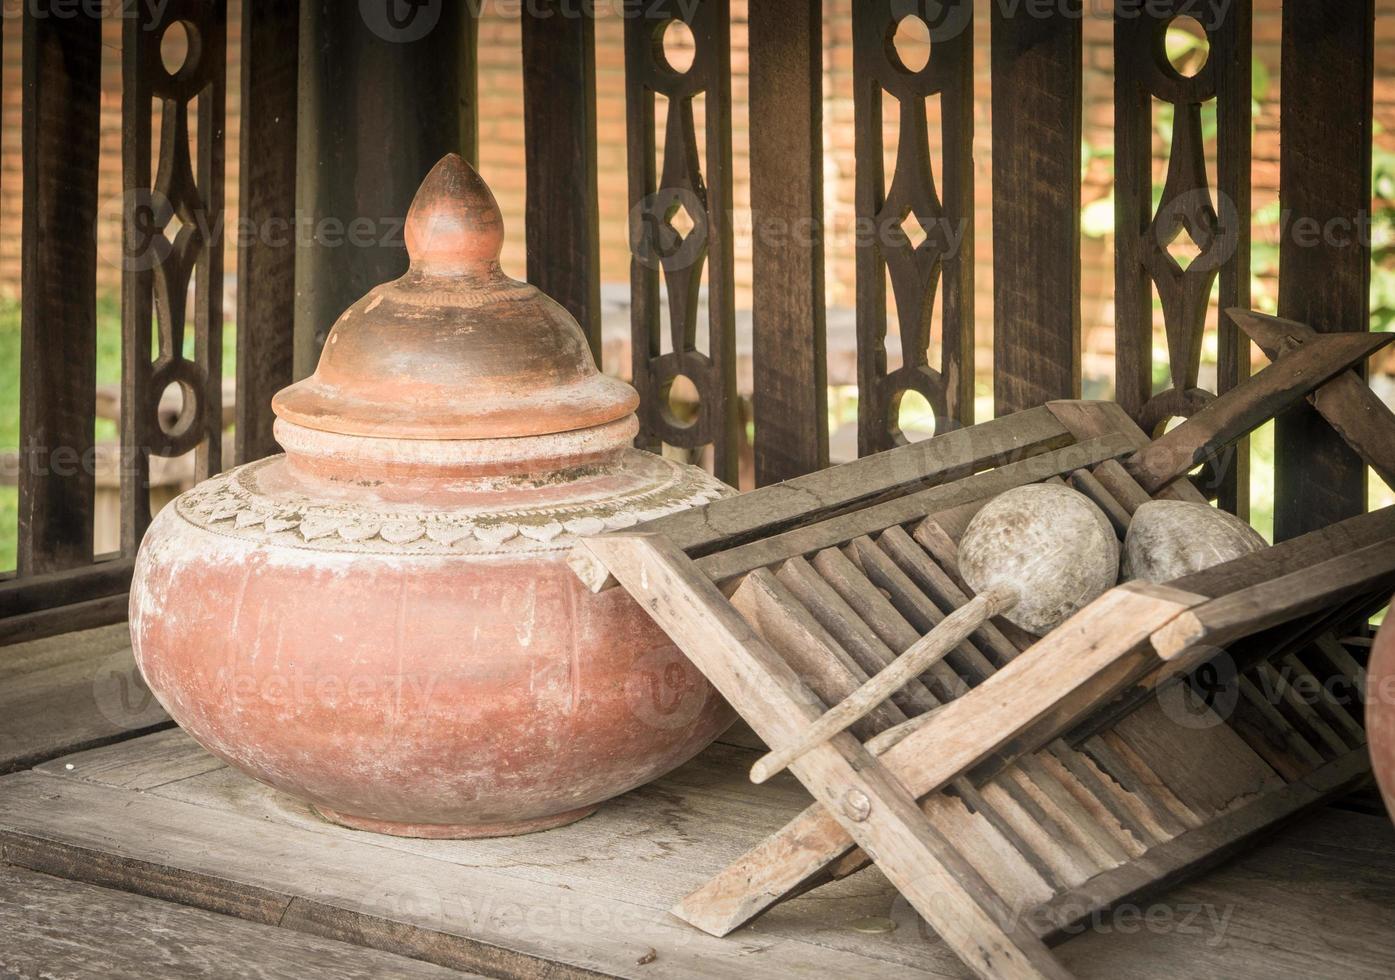 Thaise keramische drinkwatercontainer foto